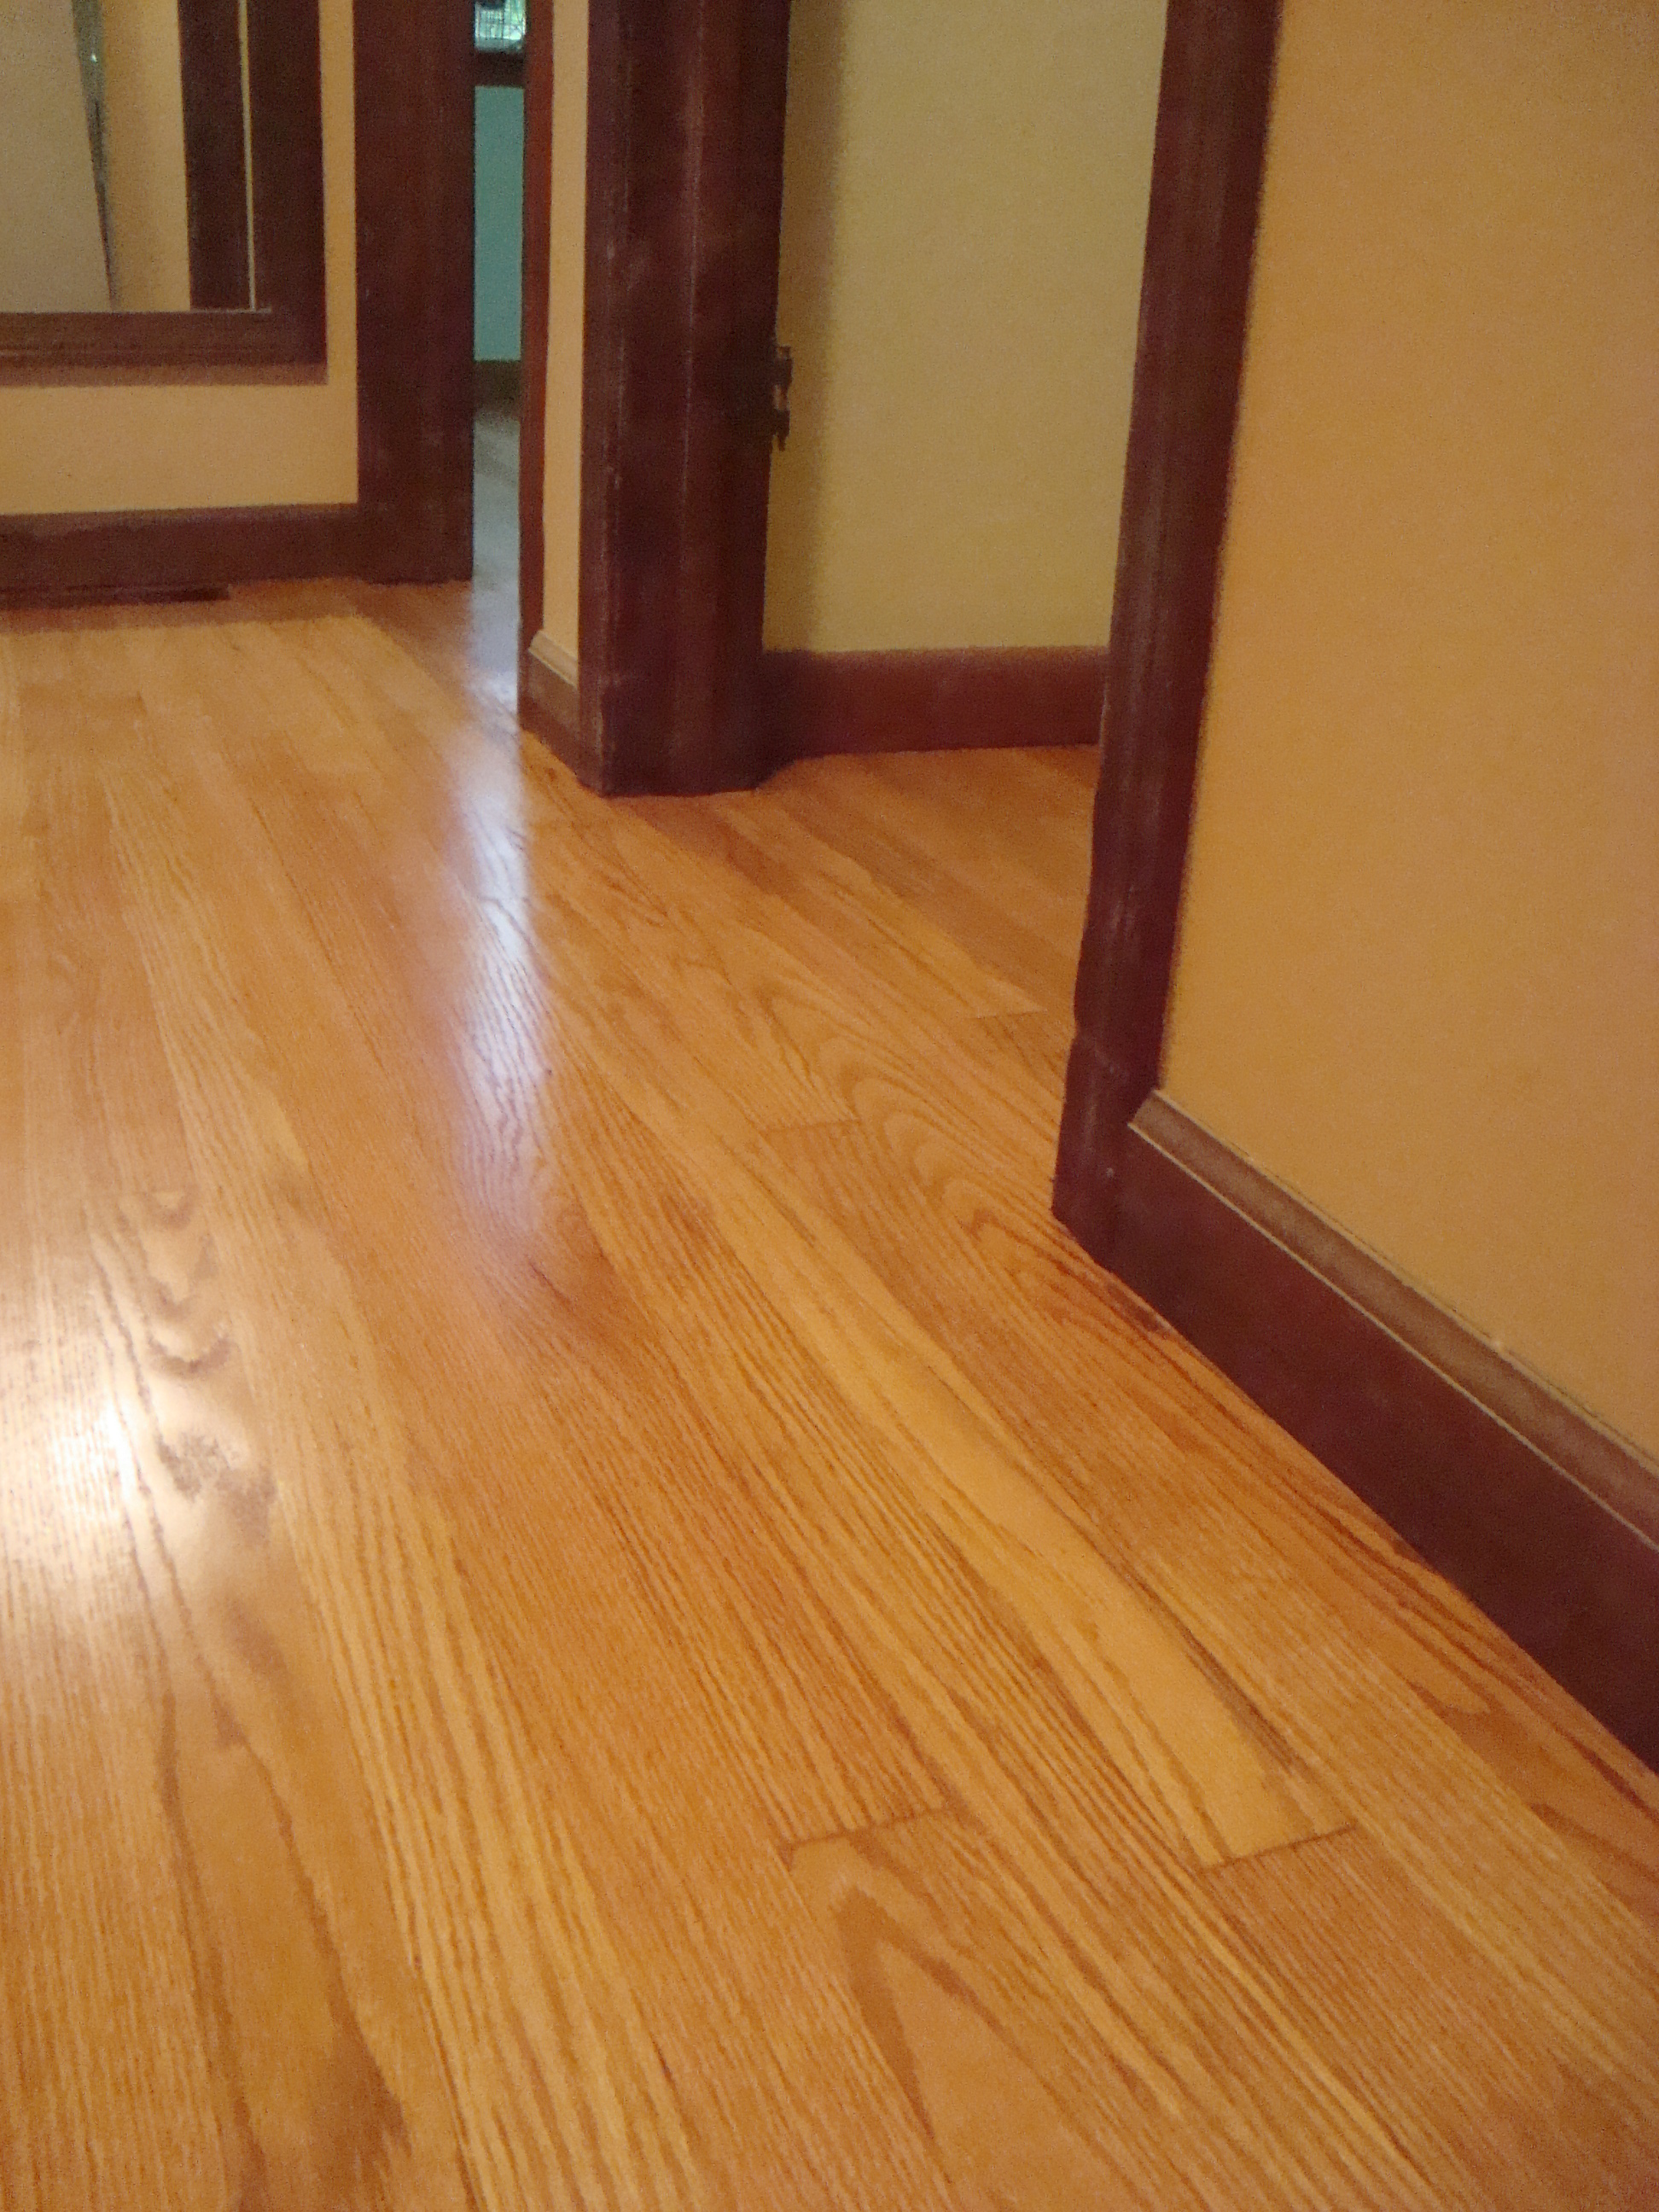 Refinishing Old Hardwood floors that are damaged stain